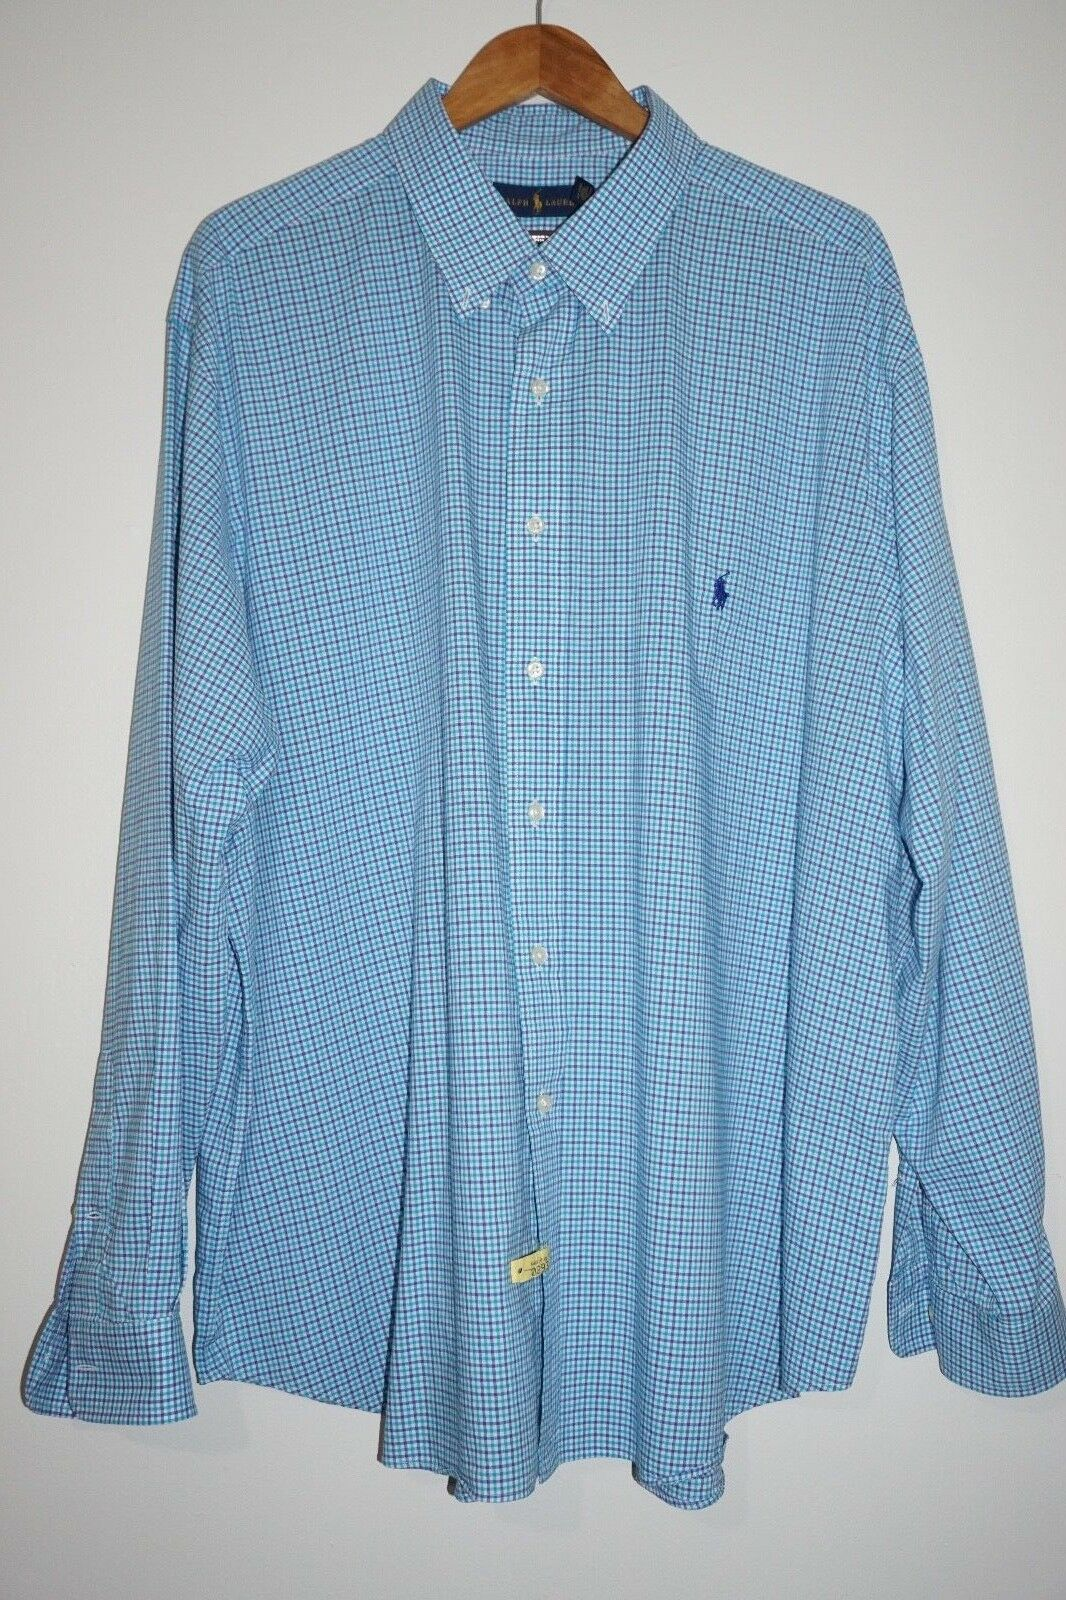 RALPH LAUREN Bleu Blanc Plaid voiturereaux Boutonnée Bleu Marine Pony Shirt Taille  2XB BIG